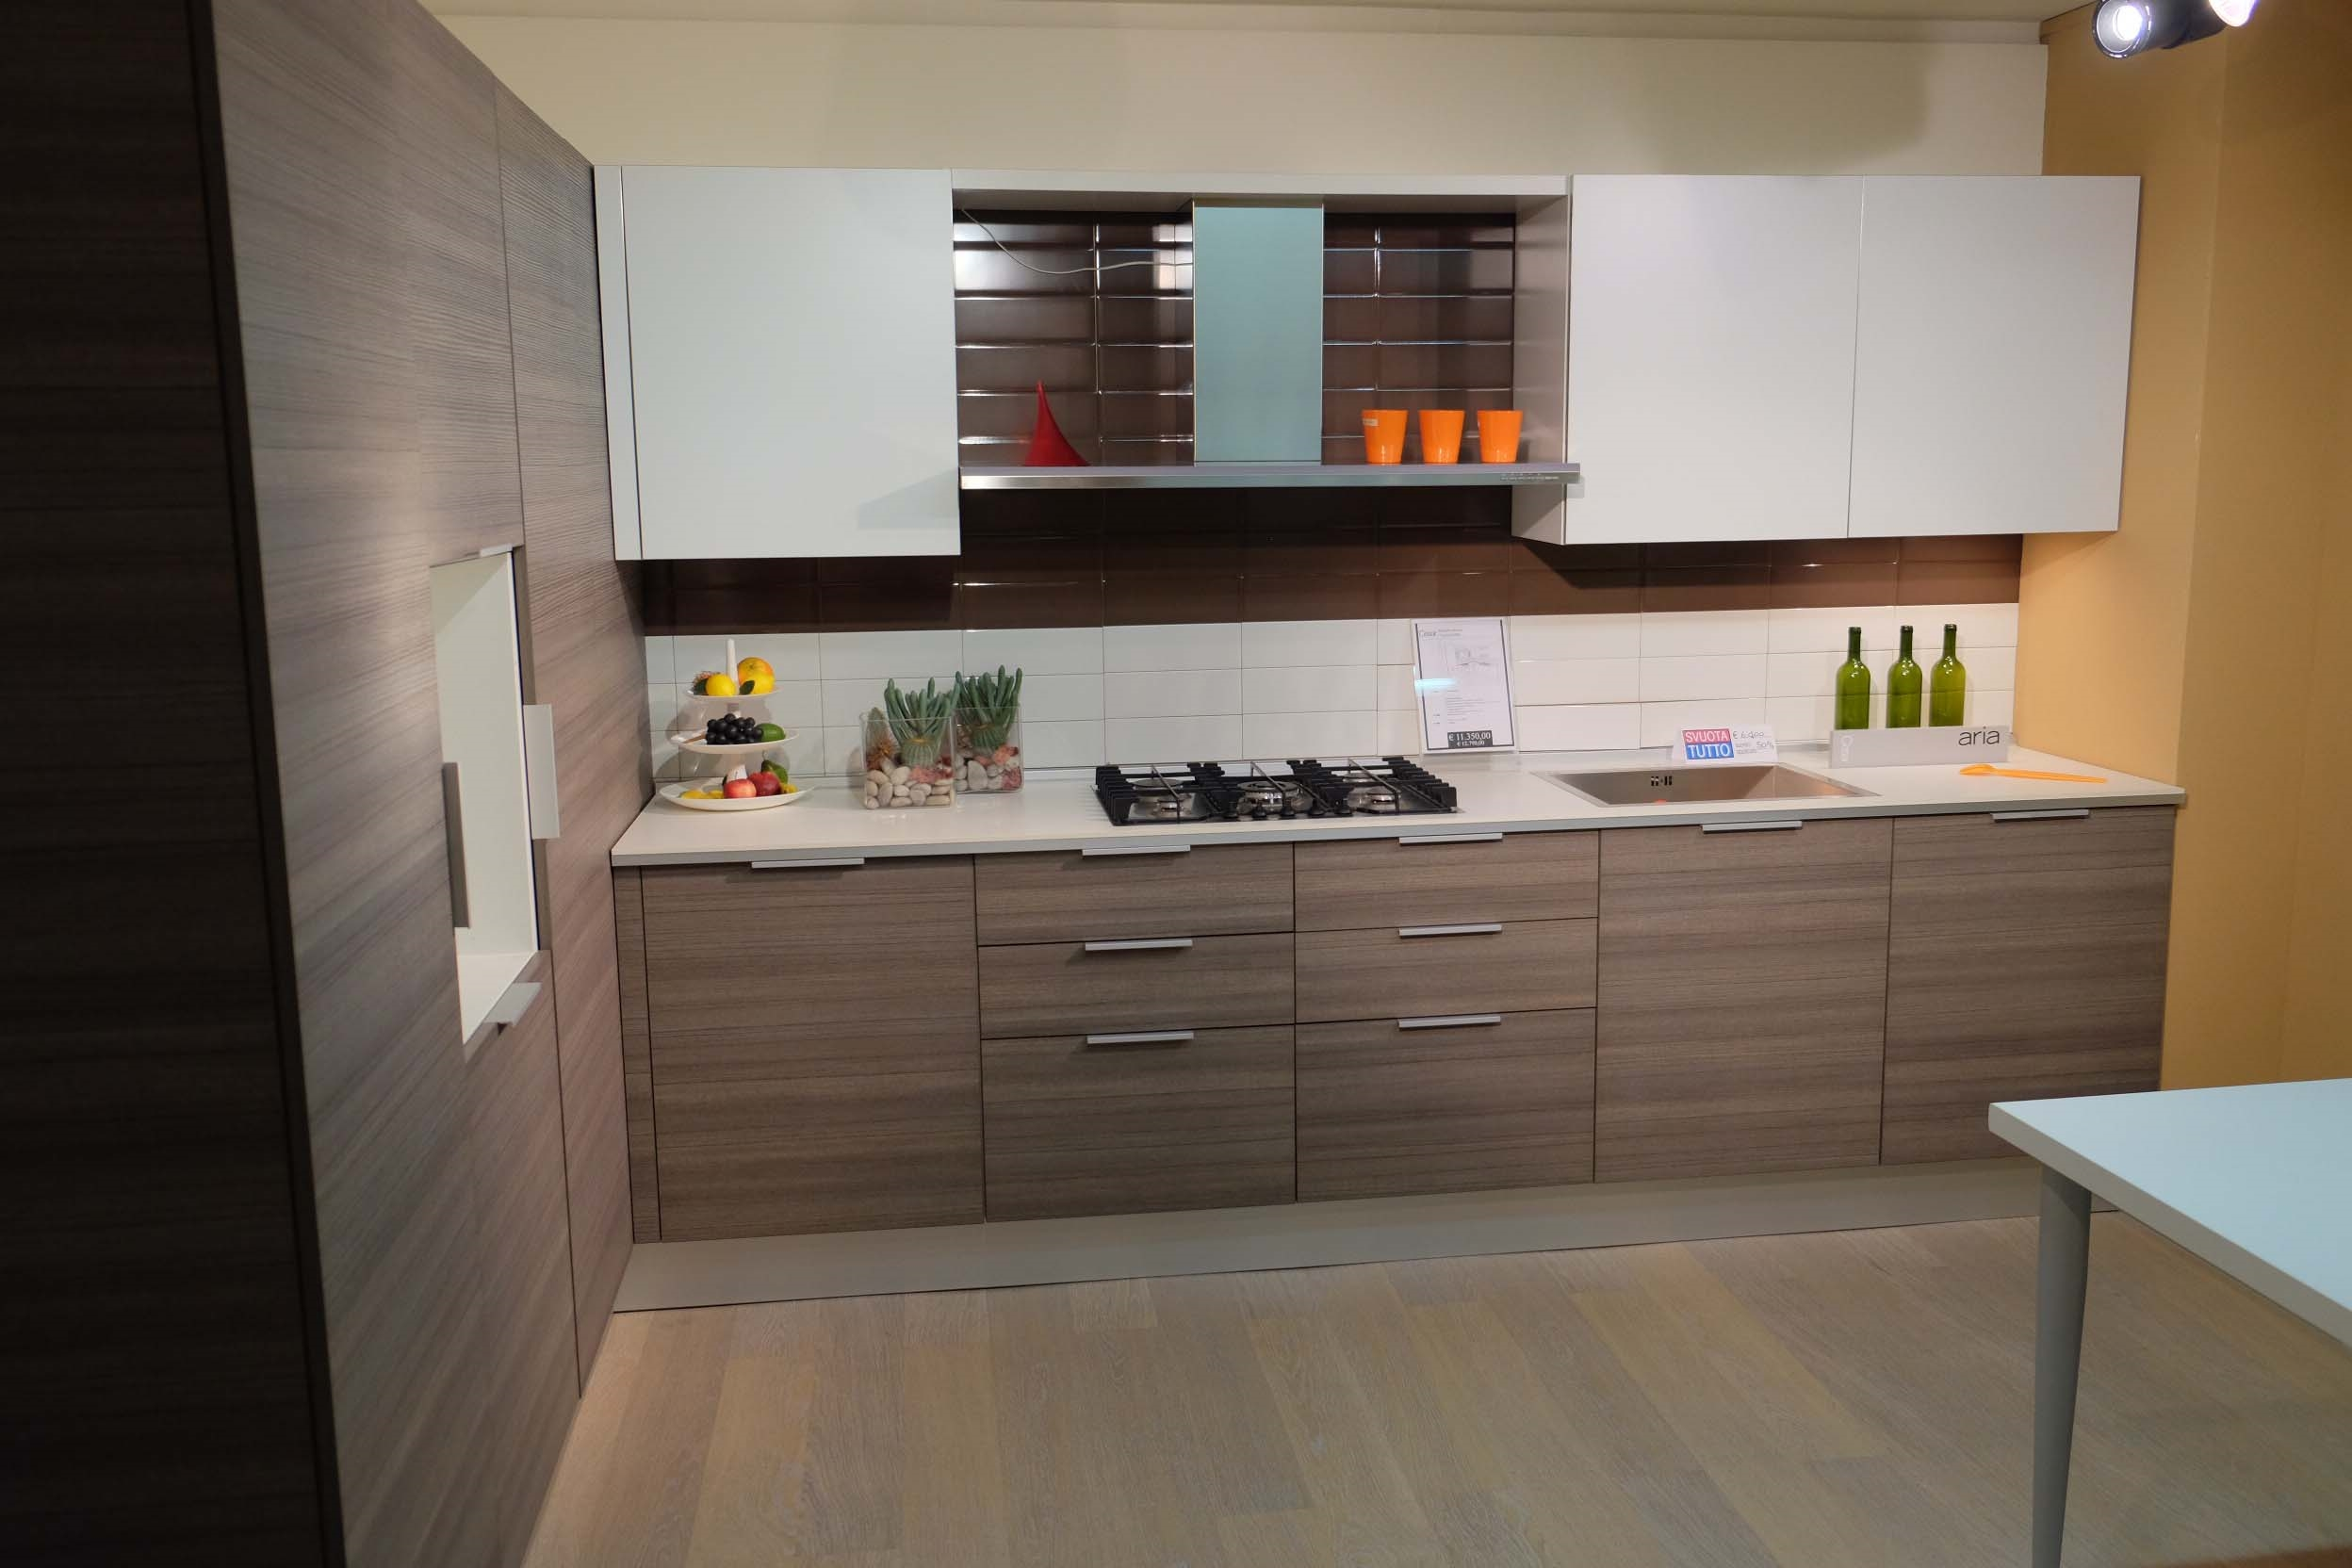 Cucina cesar cucine aria scontato del 62 cucine a - Laminato in cucina ...